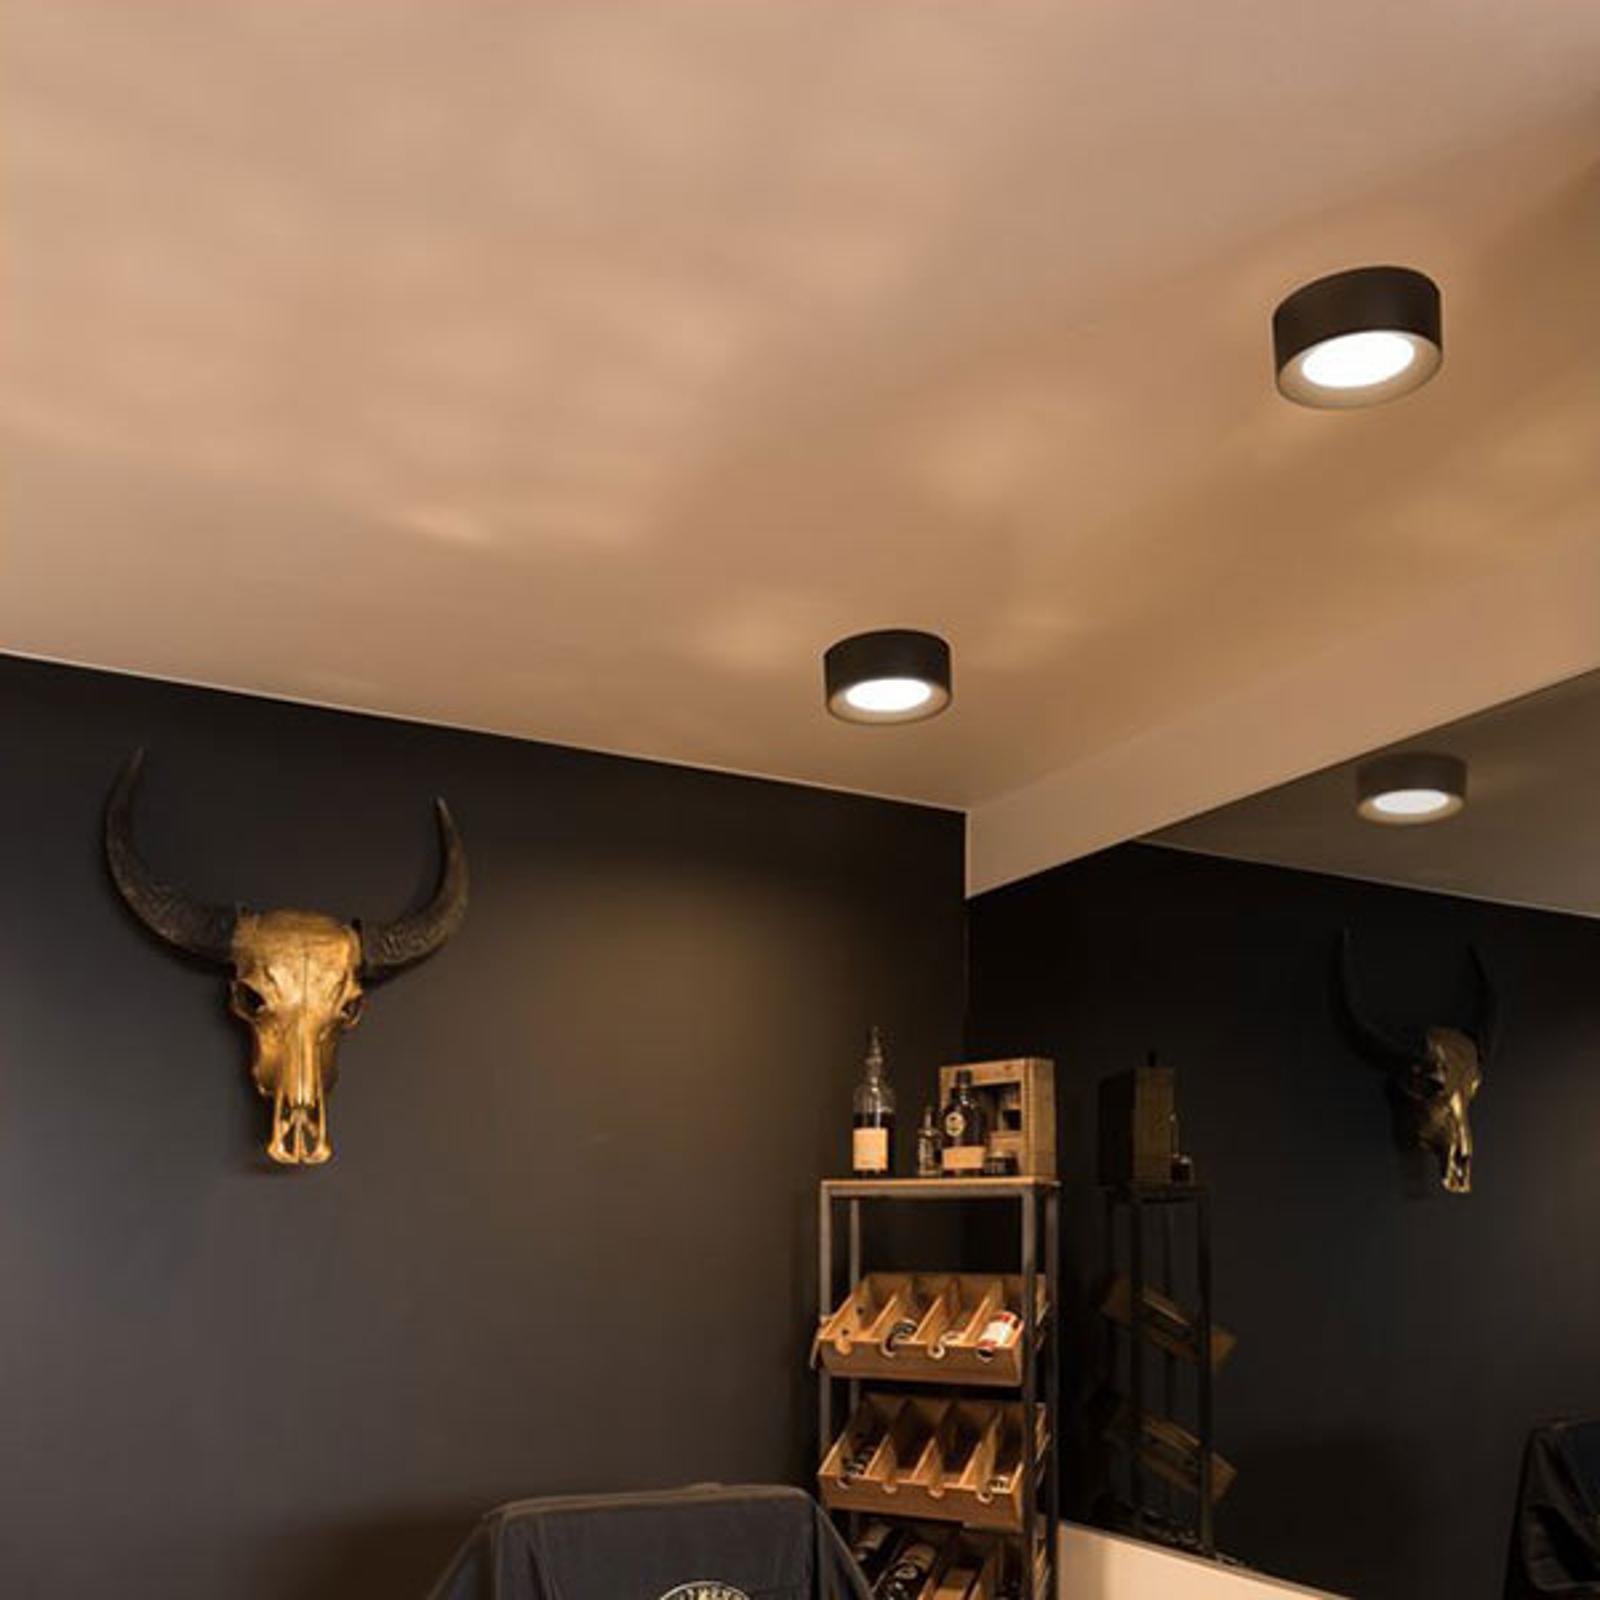 SLV Fera lampa sufitowa LED, Ø 20 cm czarna matowa